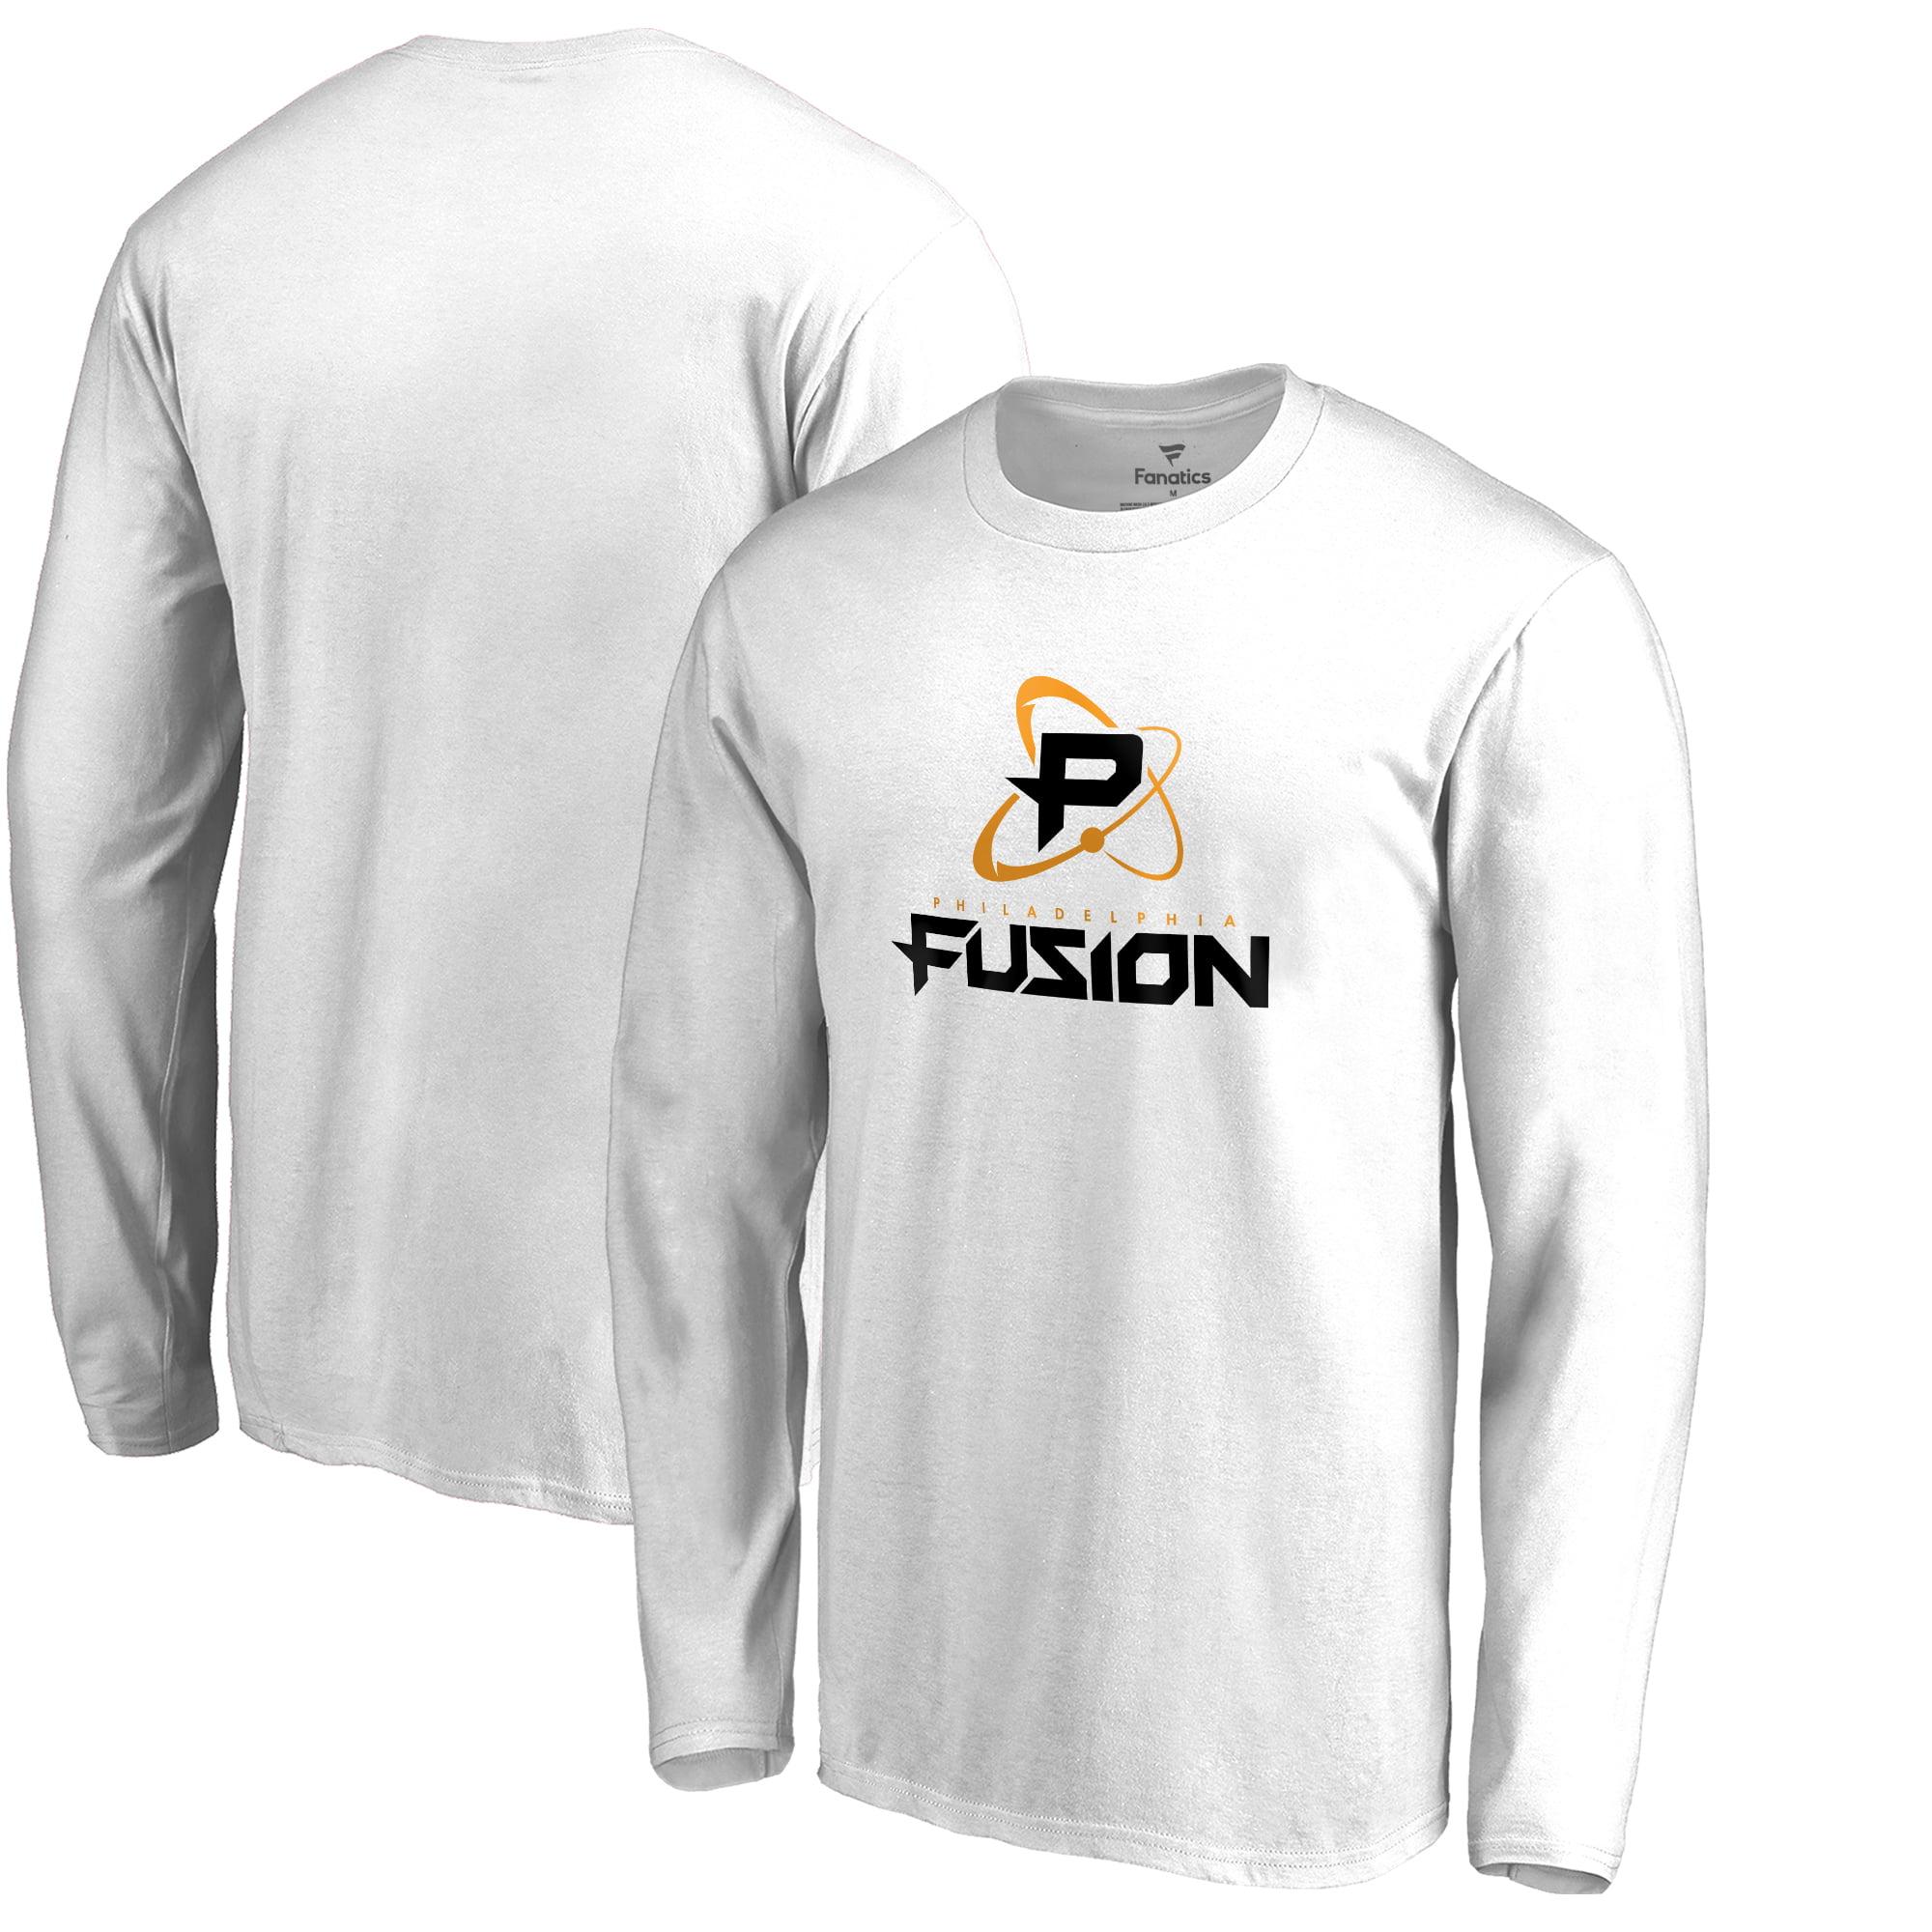 Philadelphia Fusion Fanatics Branded Team Identity Long Sleeve T-Shirt - White